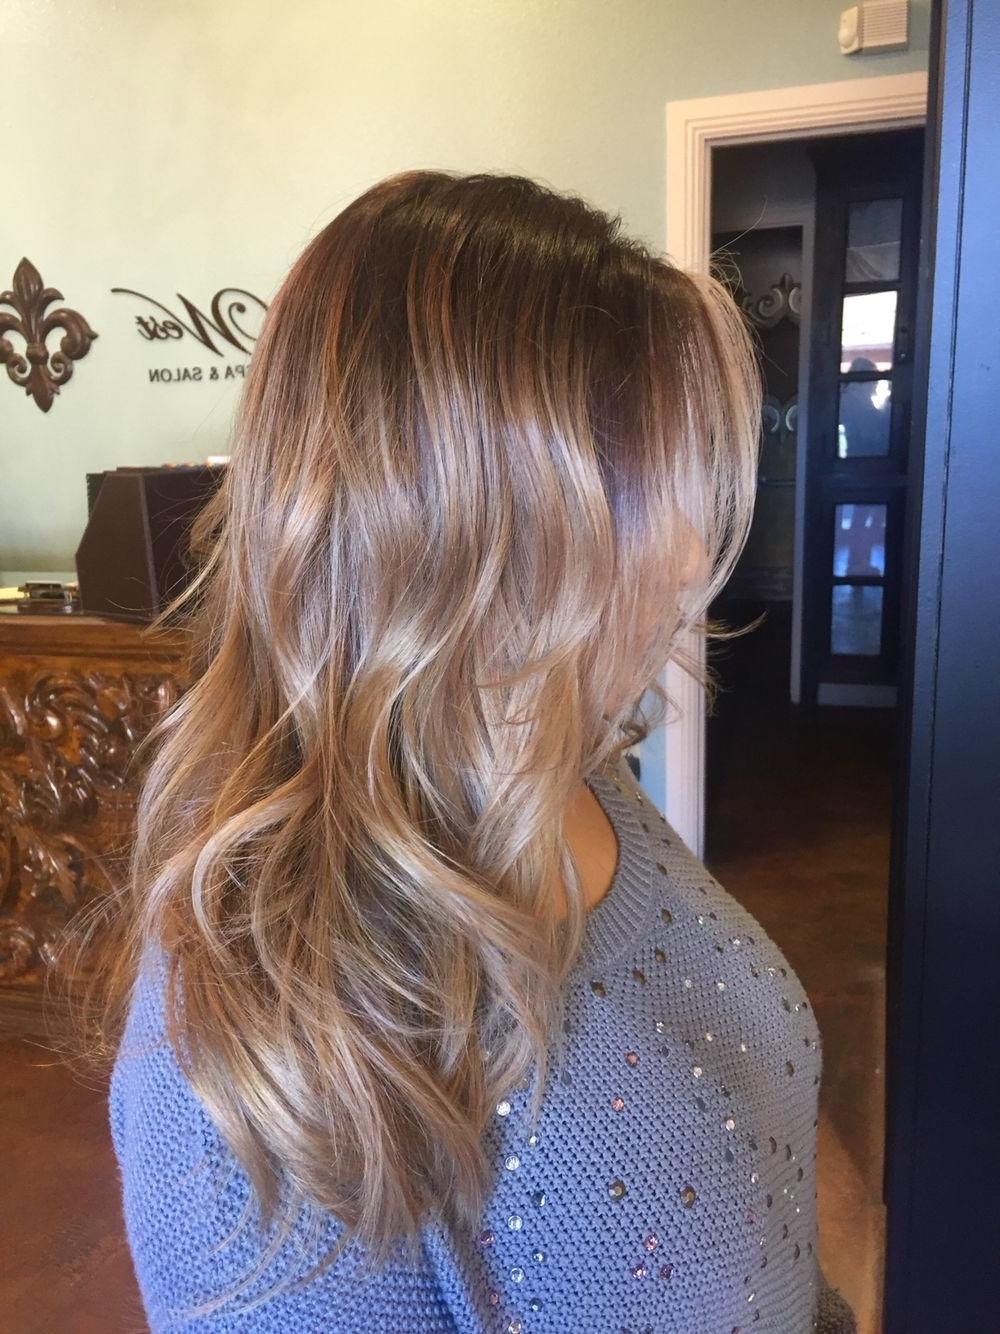 Cream Soda! #blonde #redkenhair #olaplex #beauty (View 3 of 20)